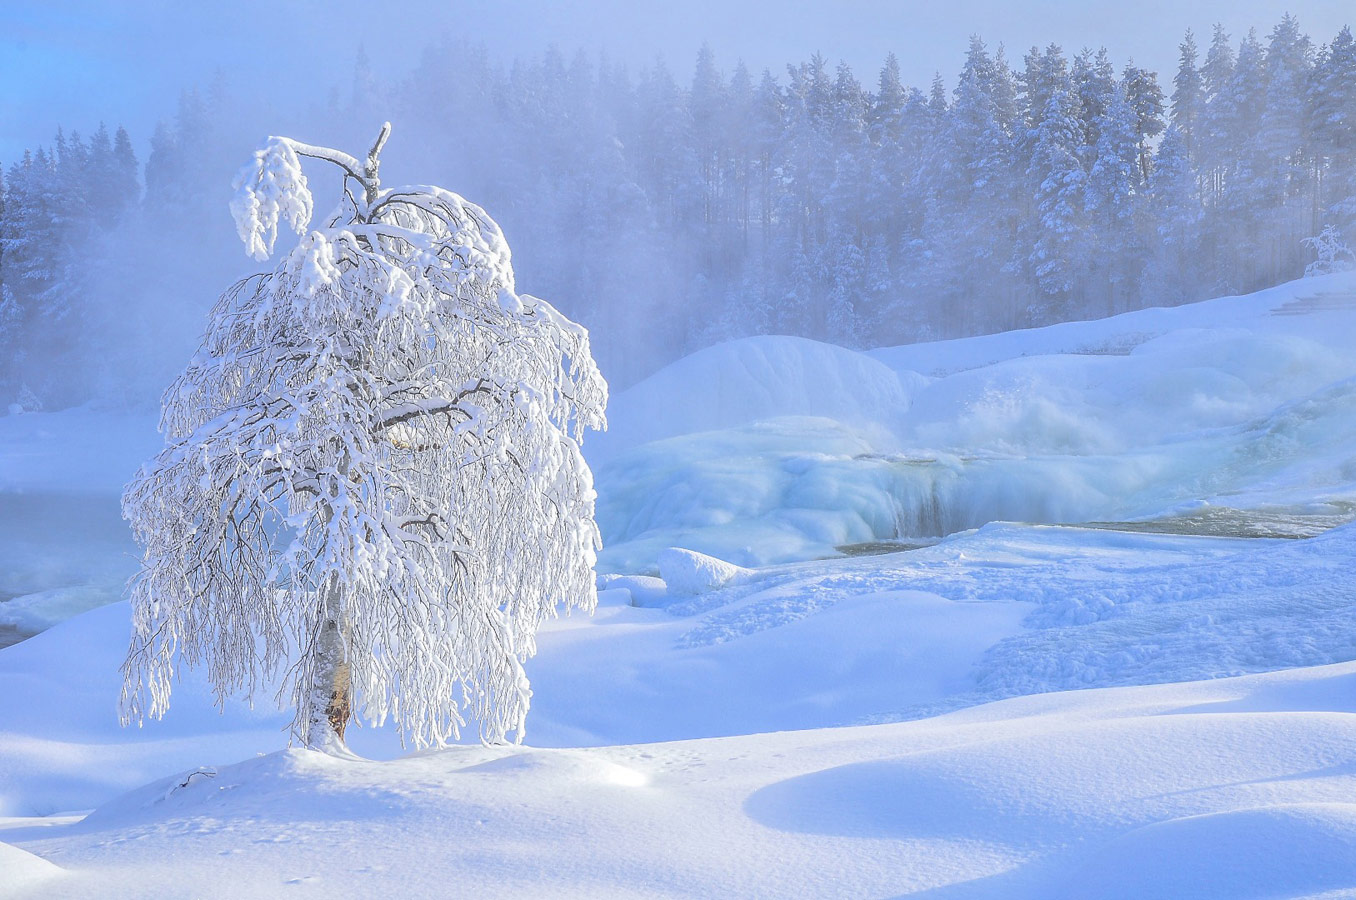 Грэм Нивен / Graham Niven, Фотоконкурс RMetS / RPS Weather